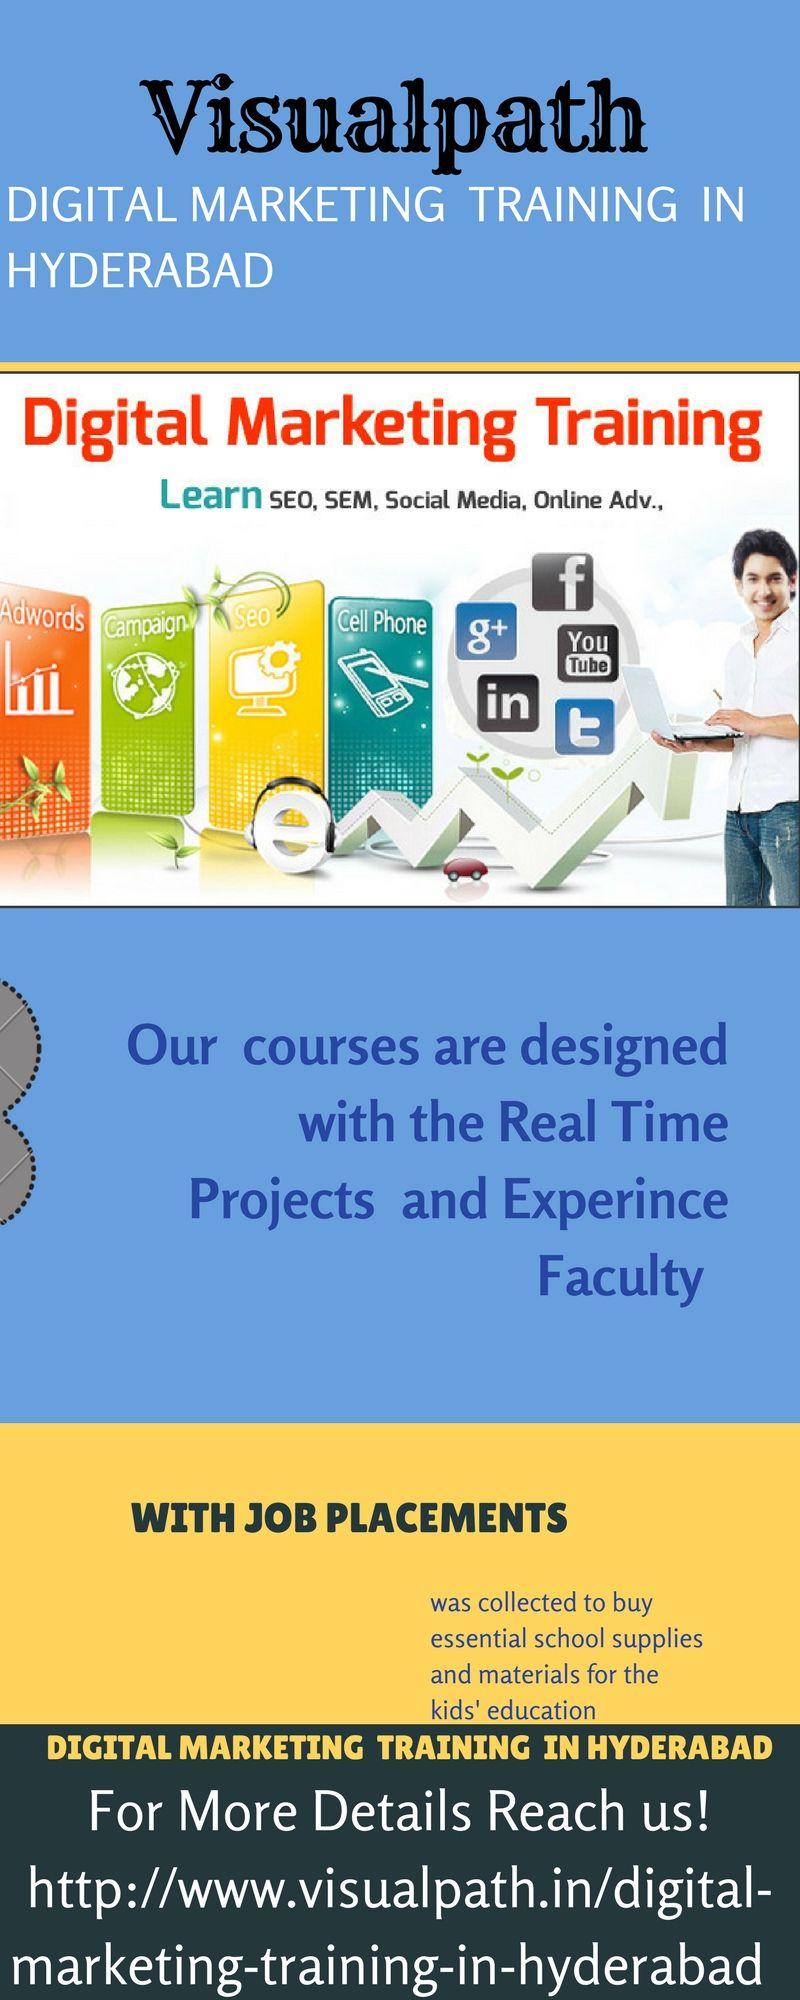 Visualpath is Offering Best Digital Marketing Training in